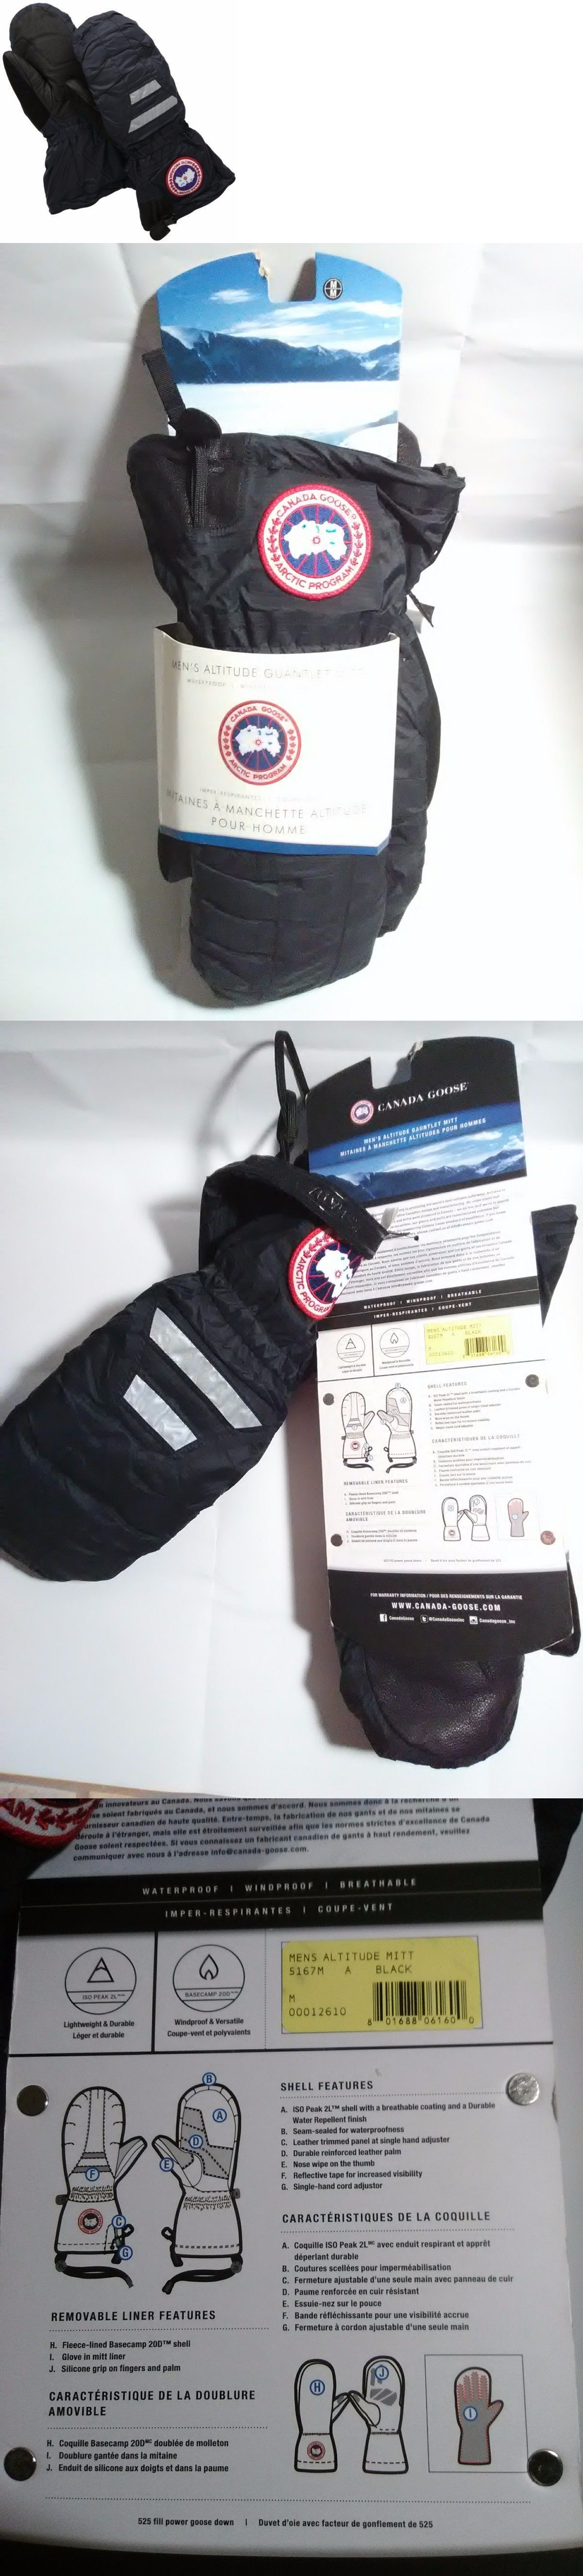 Canada Goose Gloves Ebay